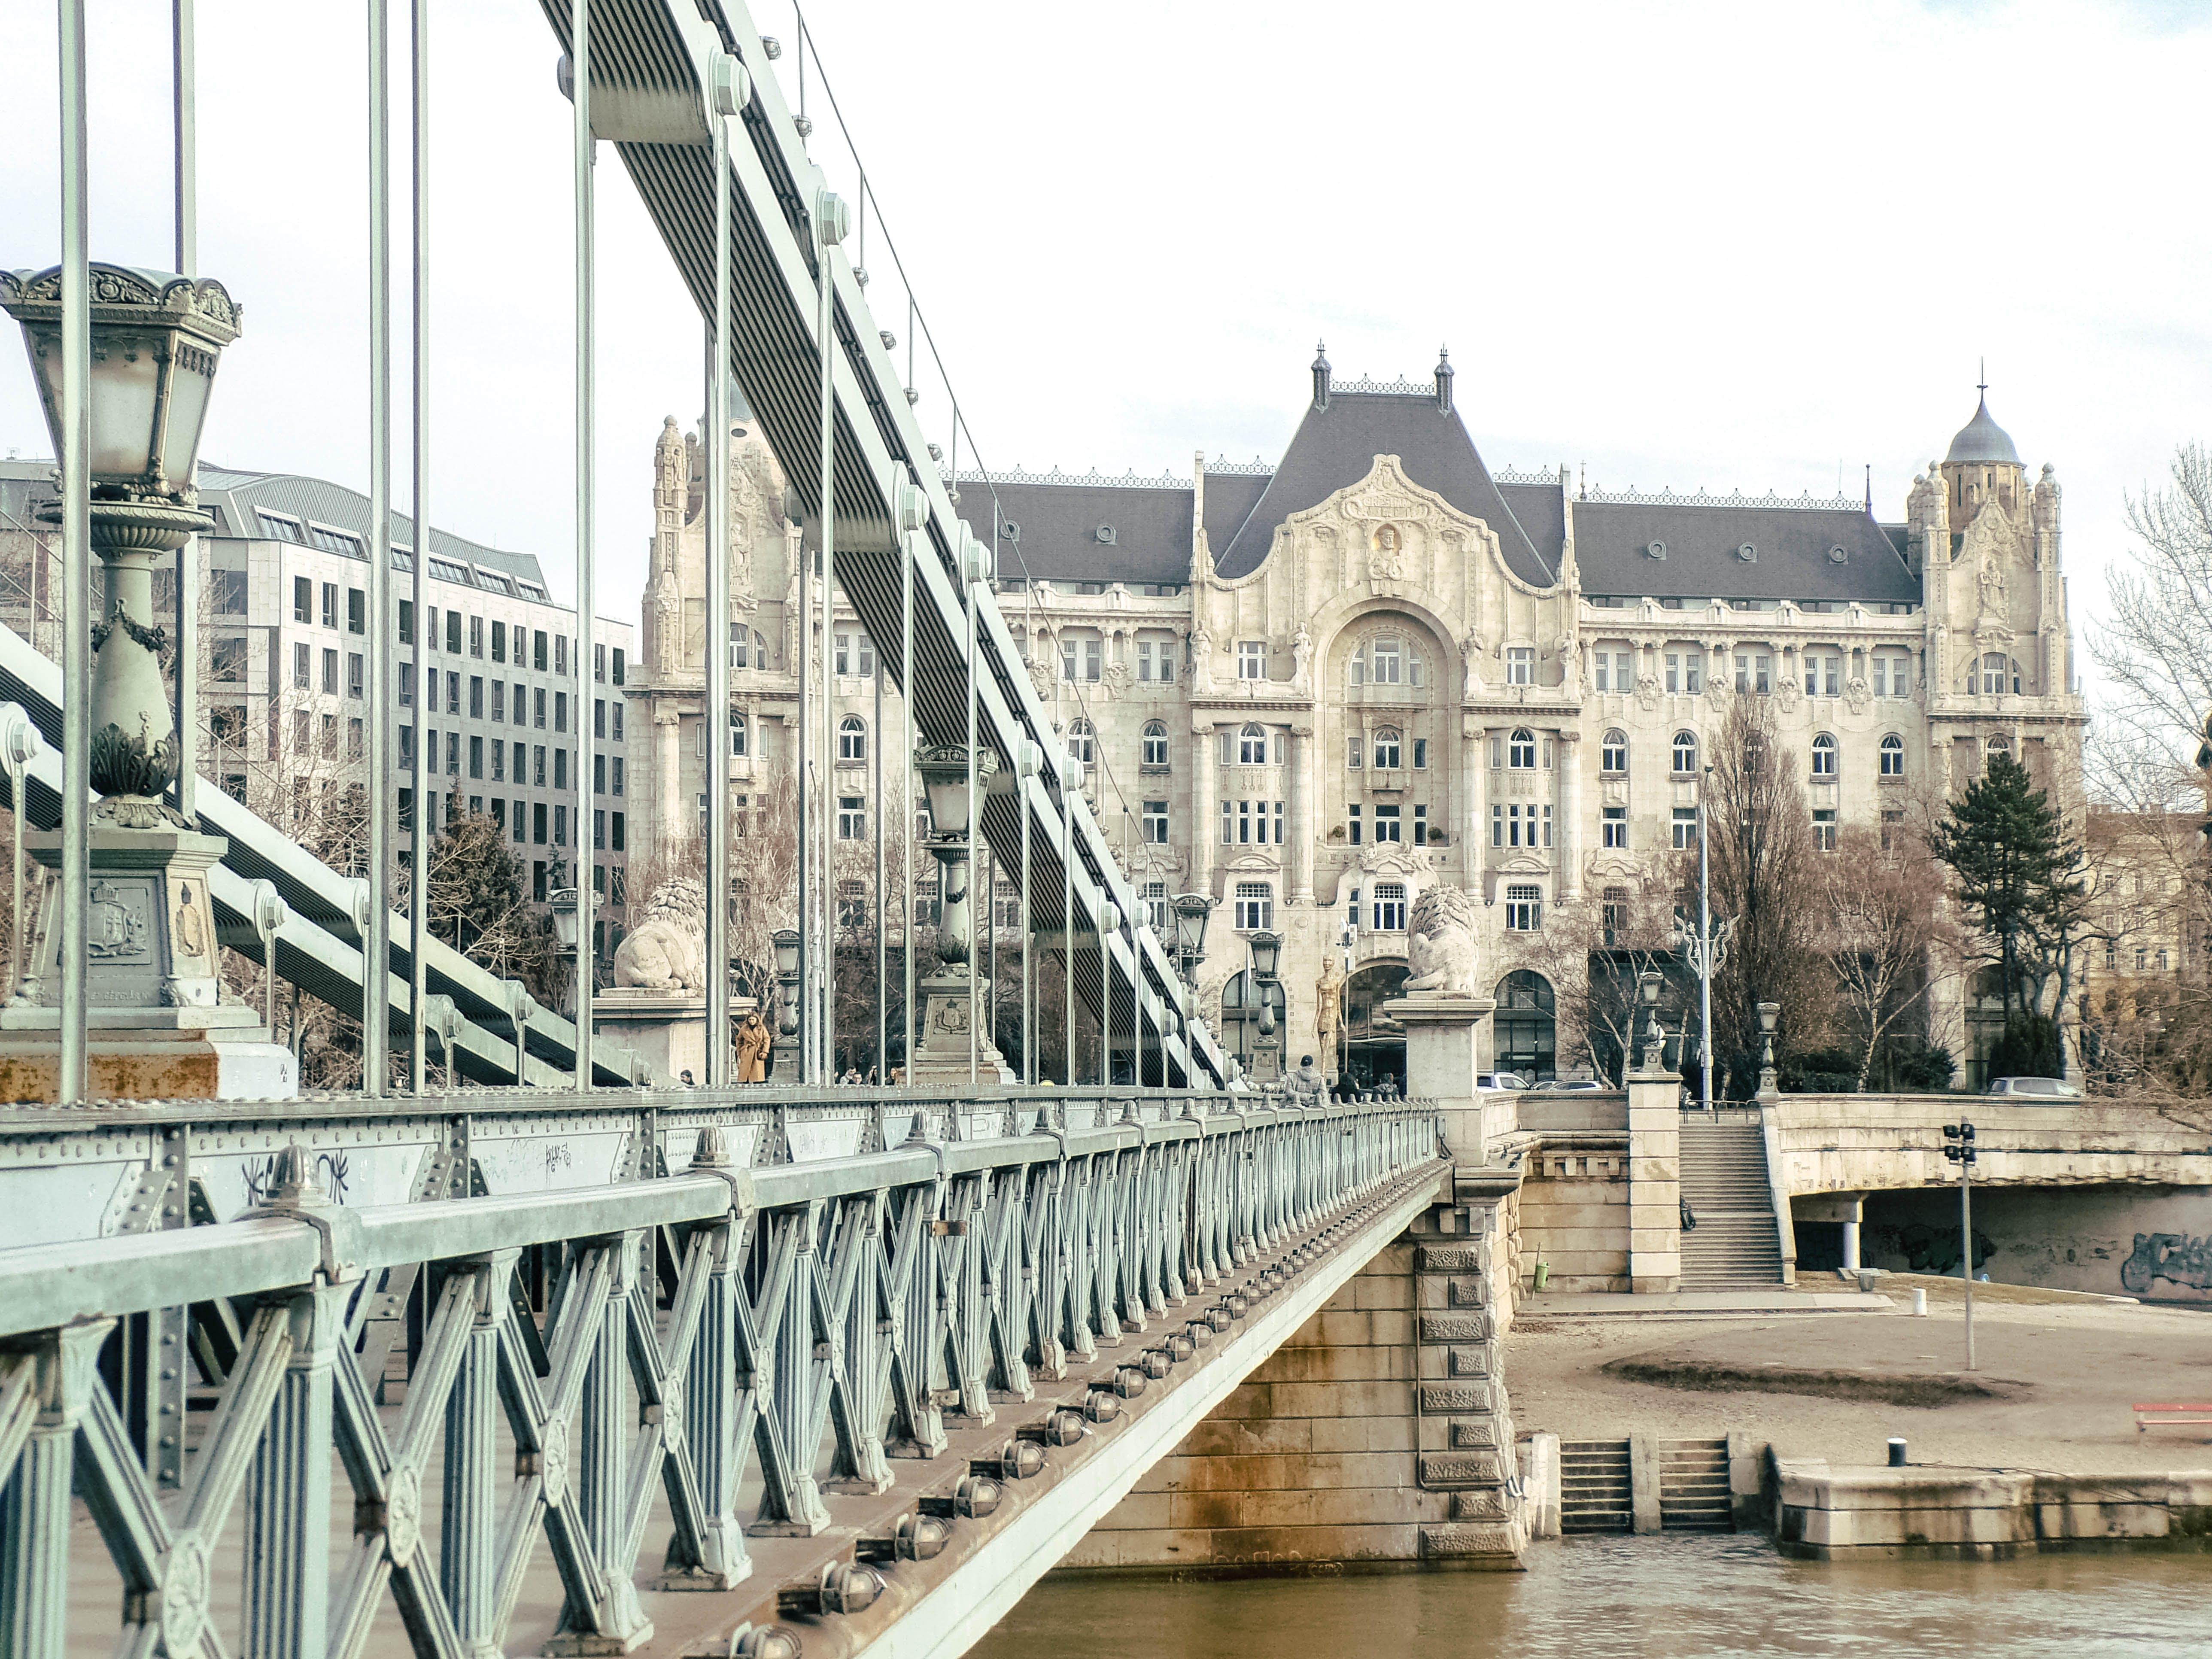 Kostenloses Stock Foto zu budapest, donau, duna, épület